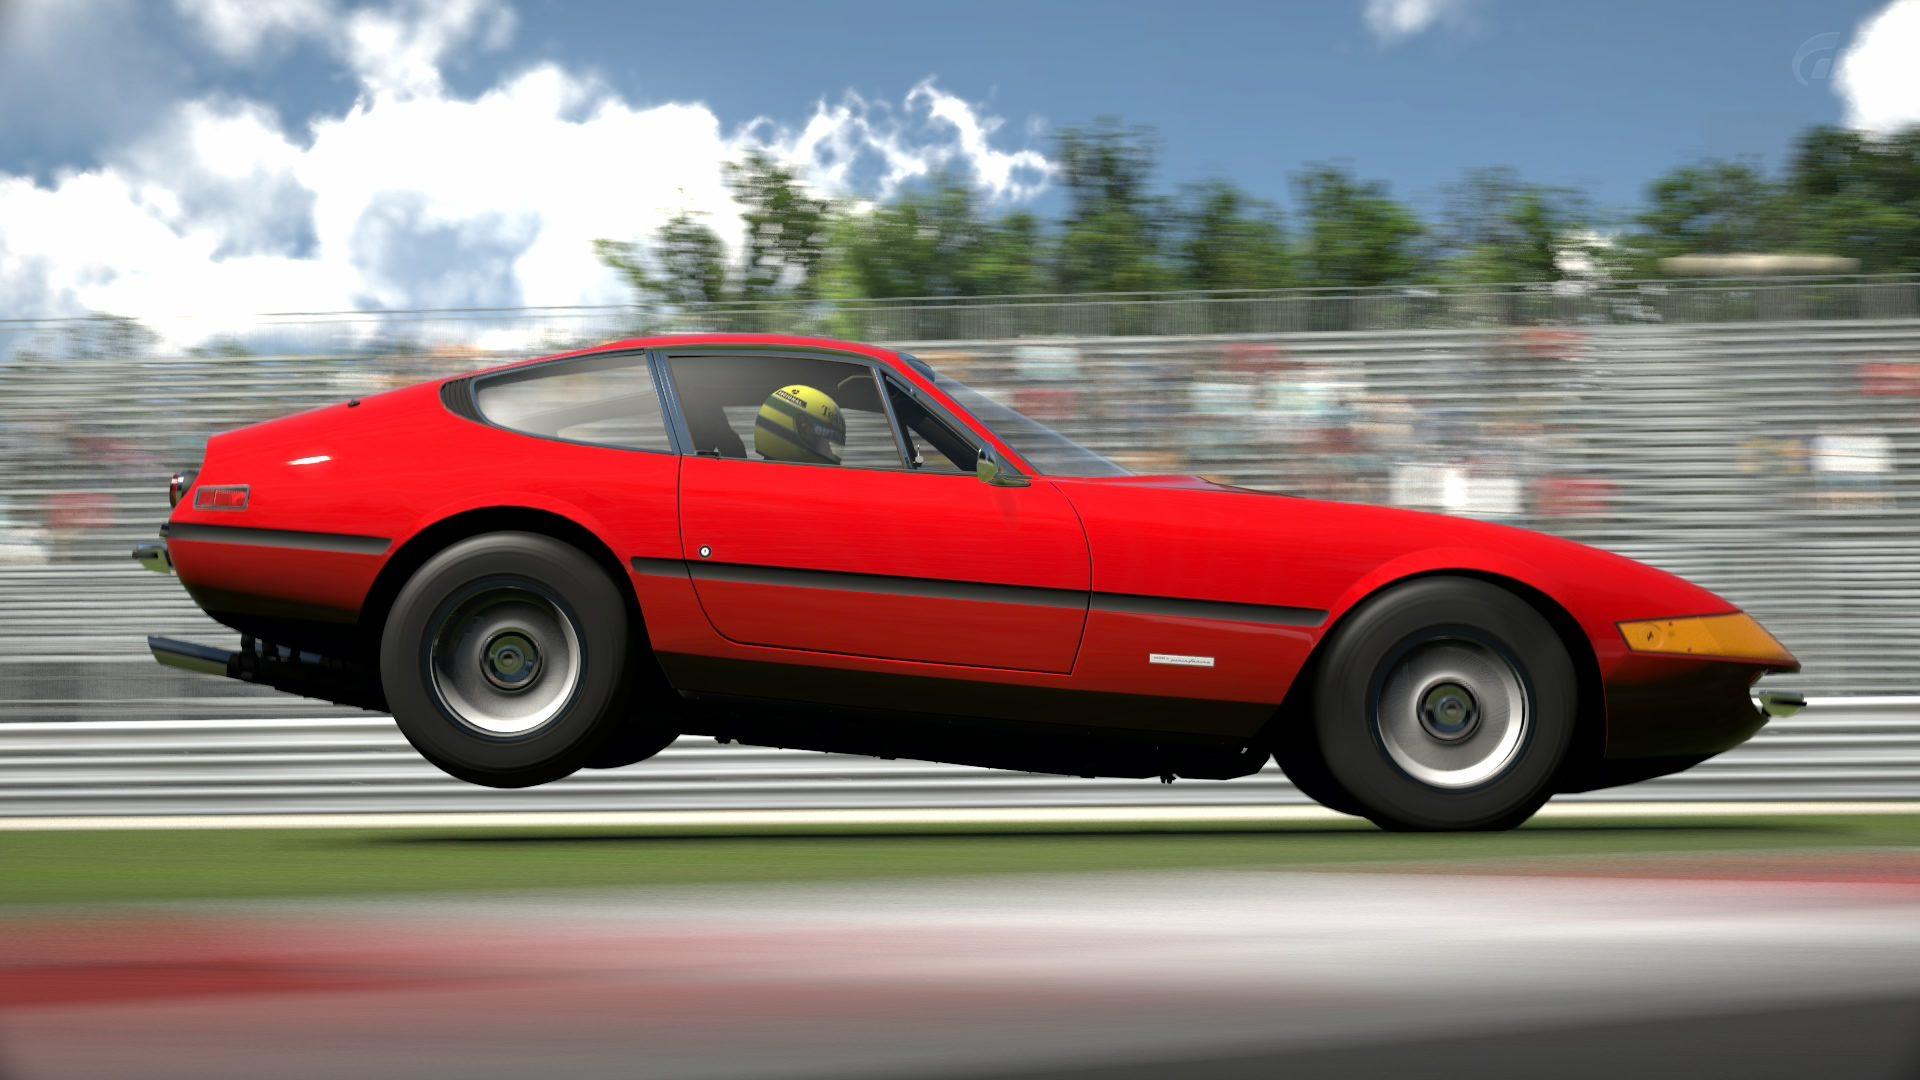 Autodromo Nazionale Monza '80s_13.jpg